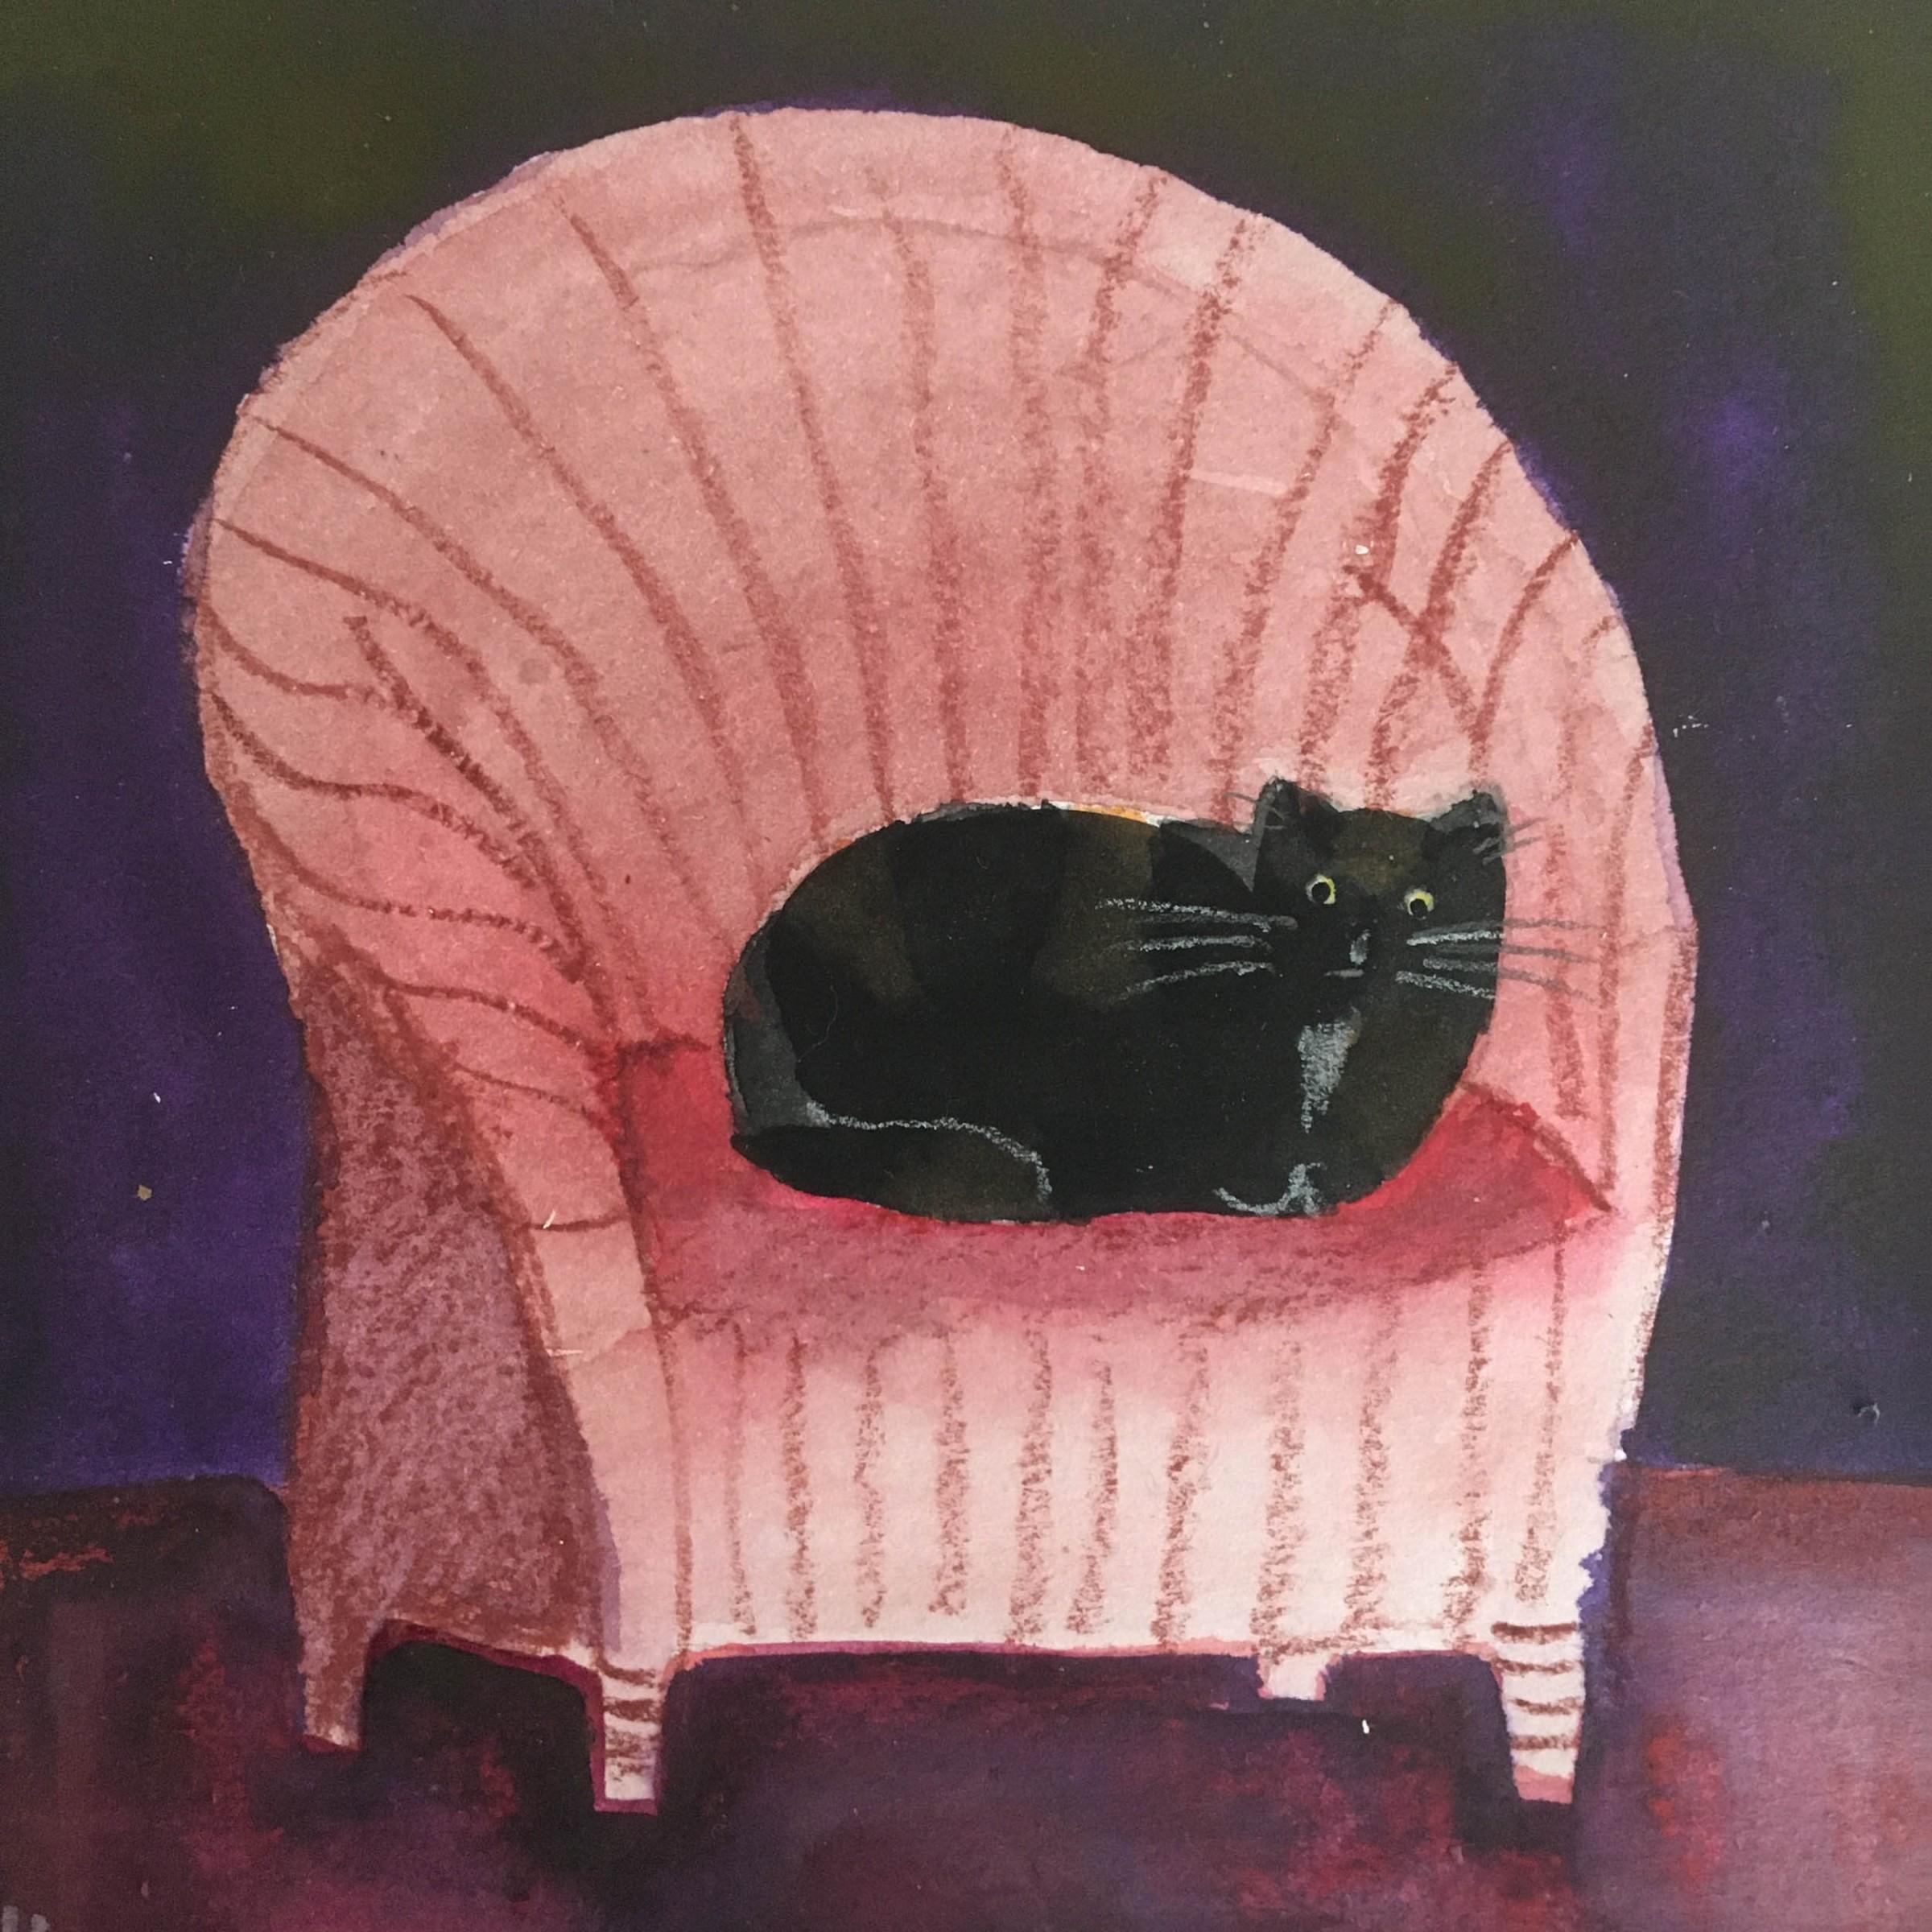 "<span class=""link fancybox-details-link""><a href=""/artists/30-jill-leman/works/12243-jill-leman-lucky-black-cat/"">View Detail Page</a></span><div class=""artist""><span class=""artist""><strong>Jill Leman</strong></span></div><div class=""title""><em>Lucky Black Cat</em></div><div class=""medium"">watercolour on paper</div><div class=""dimensions"">Frame: 20 x 20 cm<br /> Artwork: 12 x 12 cm</div><div class=""price"">£250.00</div>"